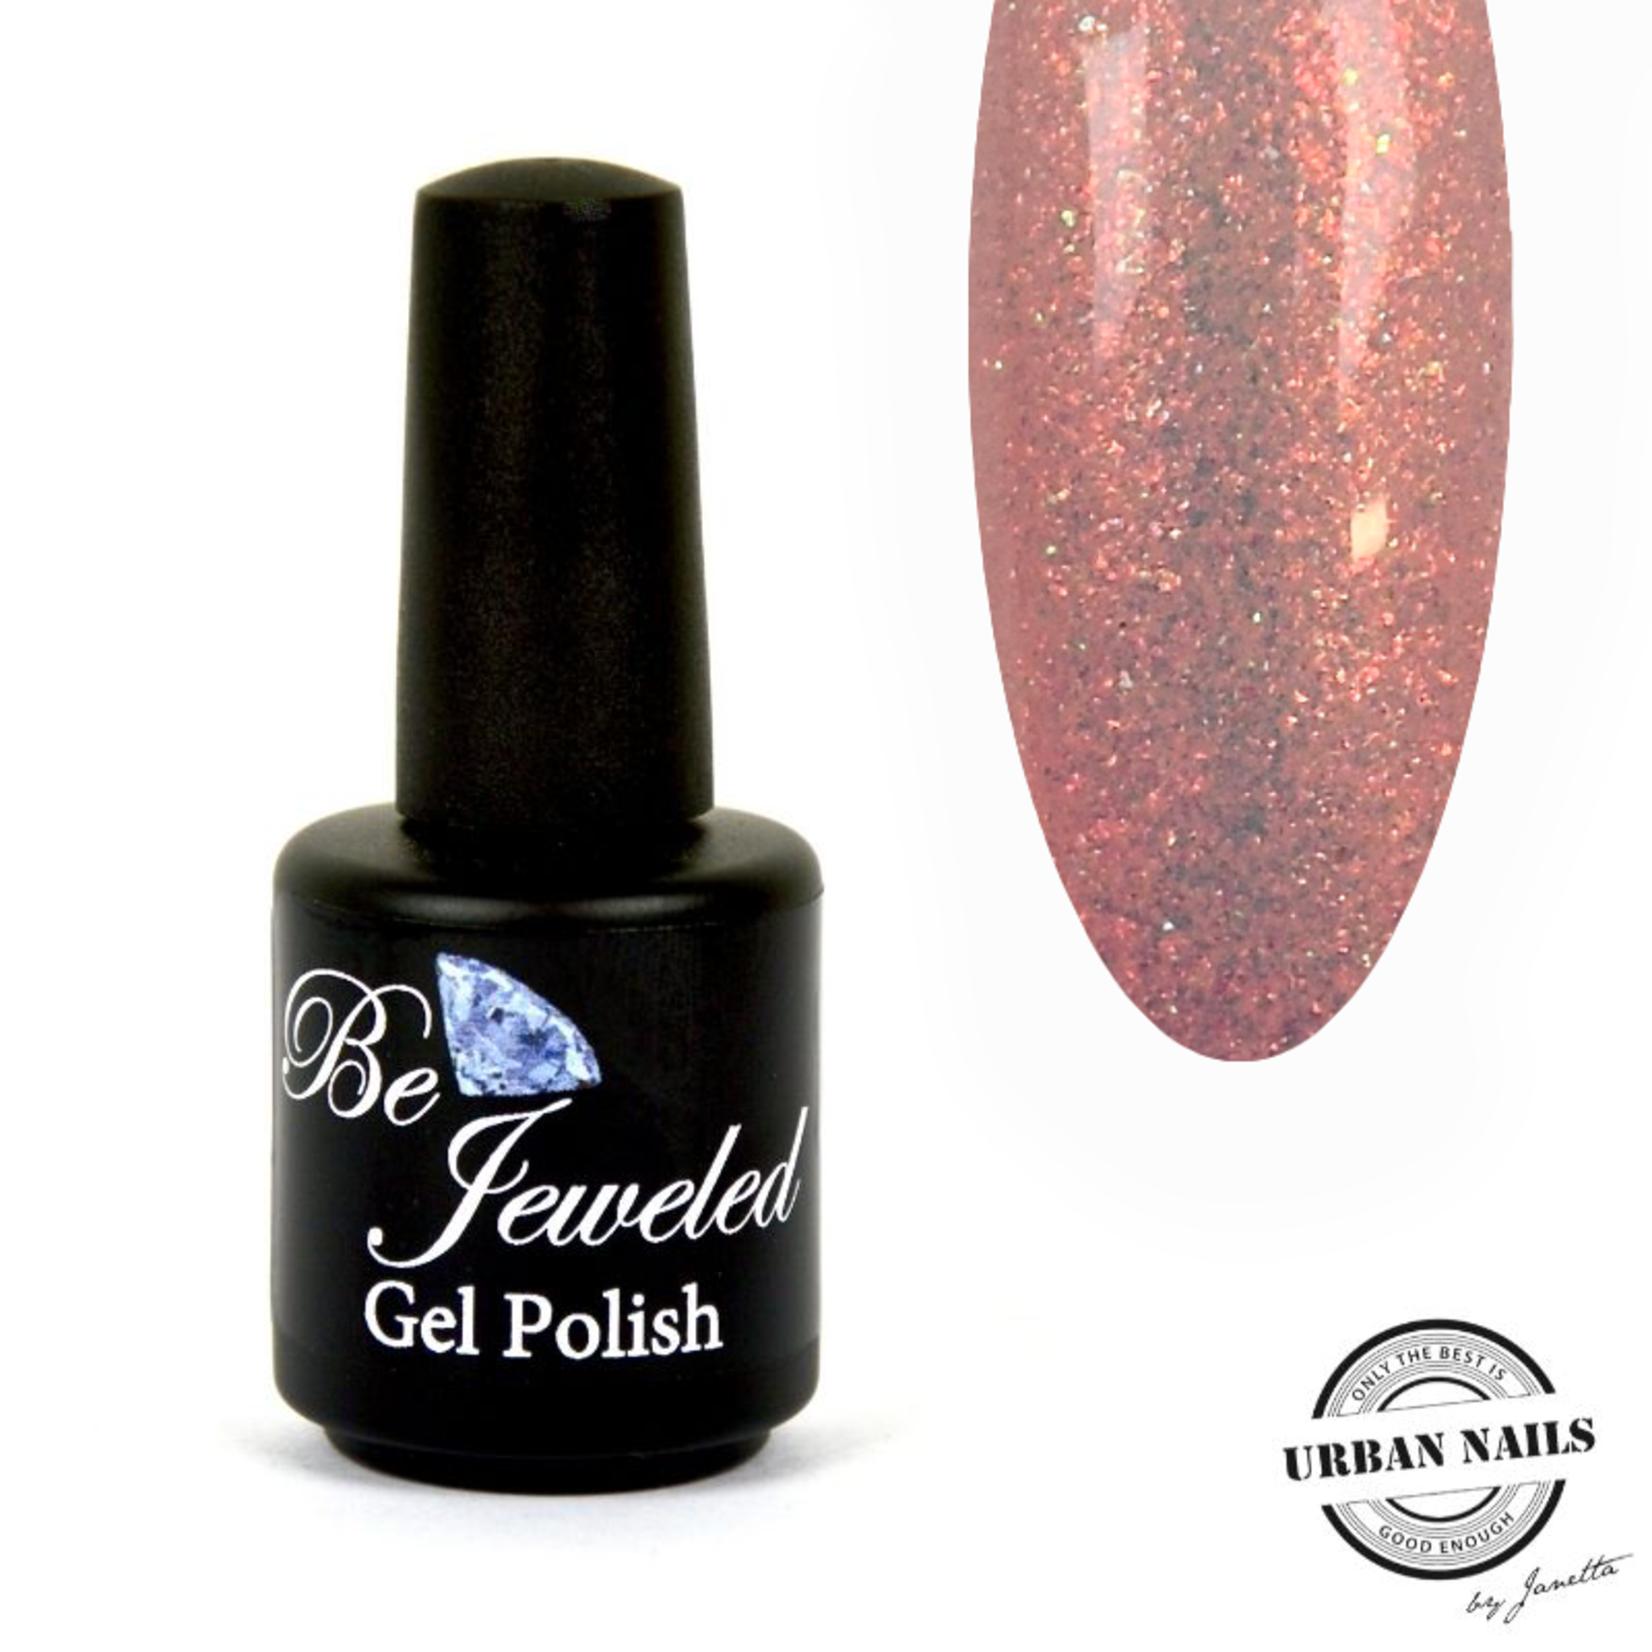 Urban Nails Be Jeweled Enchanted Gelpolish 01 Rood/Bruin